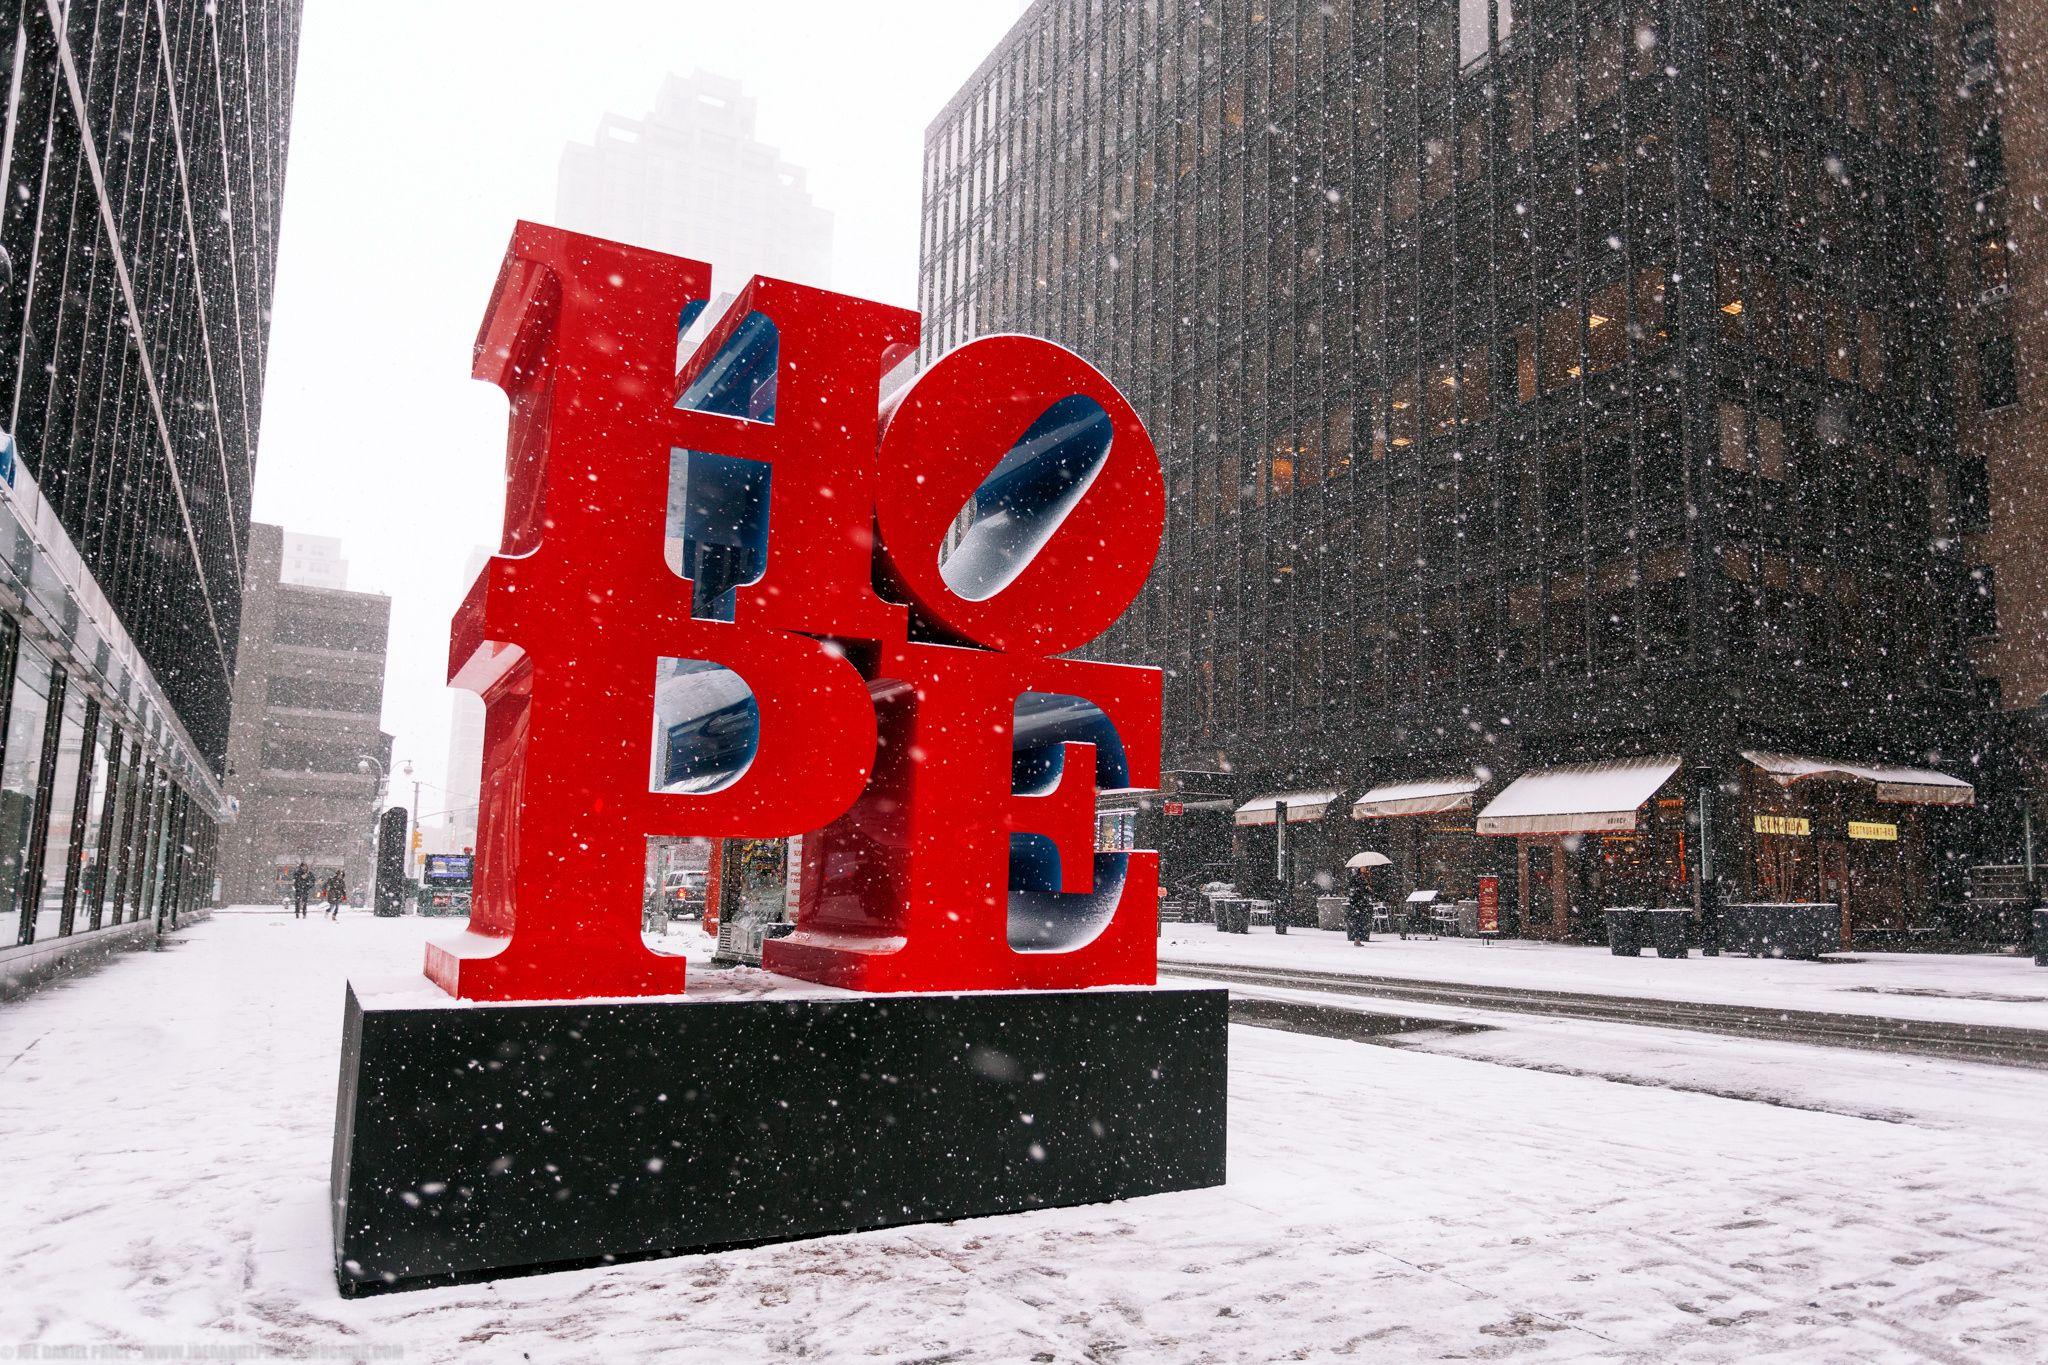 Hope, New York City, New York, America by Joe Daniel Price on 500px